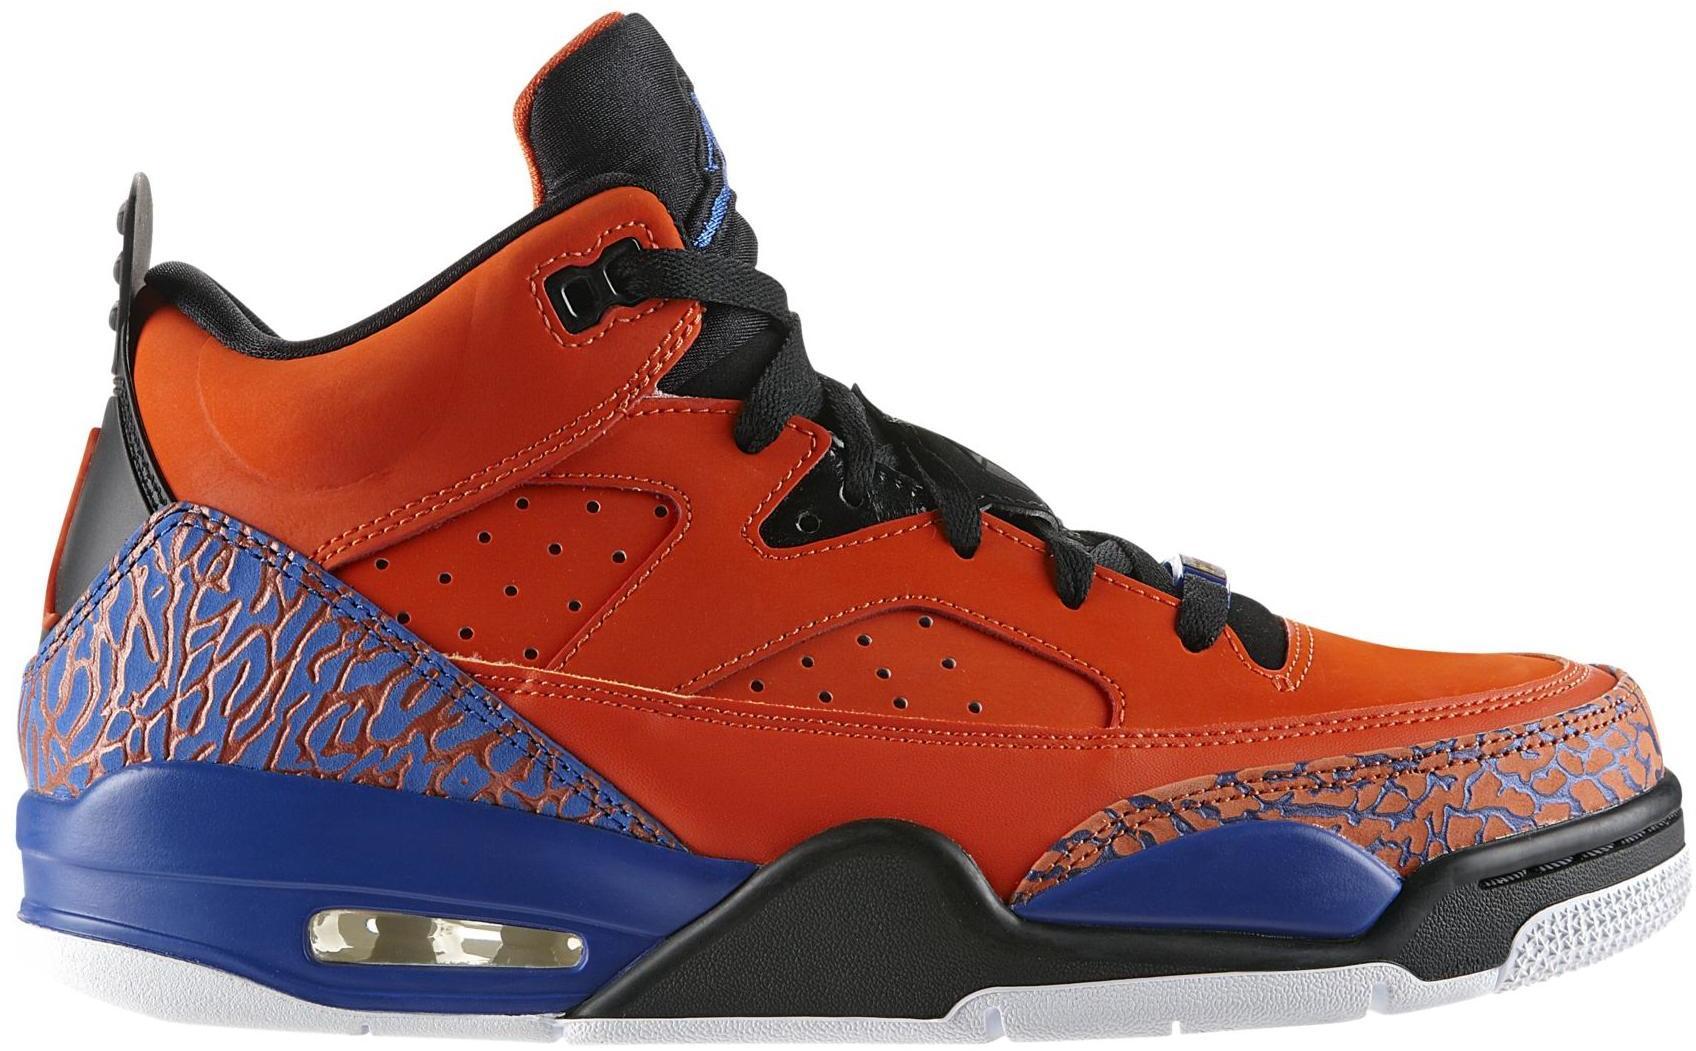 Jordan Son of Mars Low Knicks